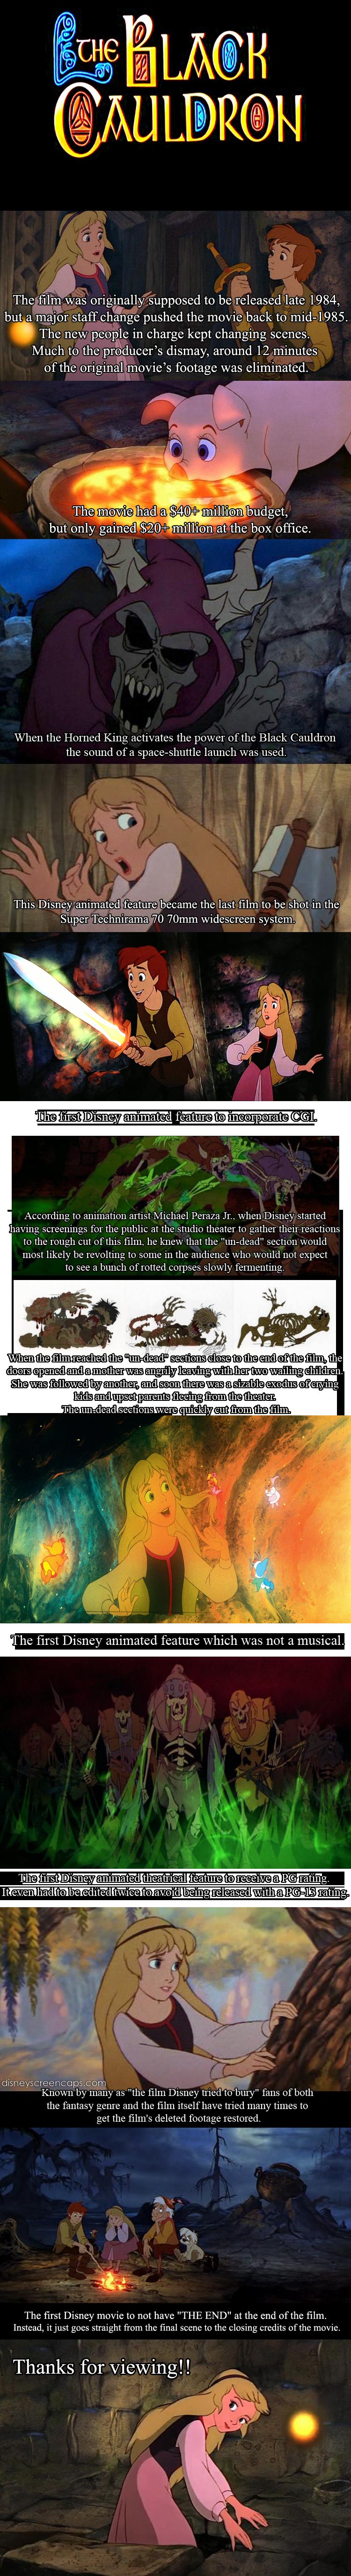 The Black Cauldron. Sources:www.imdb.com/title/tt0088814/?ref_=tt... en.wikipedia.org/wiki/The_Black_Cauld... www.slate.com/articles/arts/dvdextras... Don't sub The Black Cauldr compilation